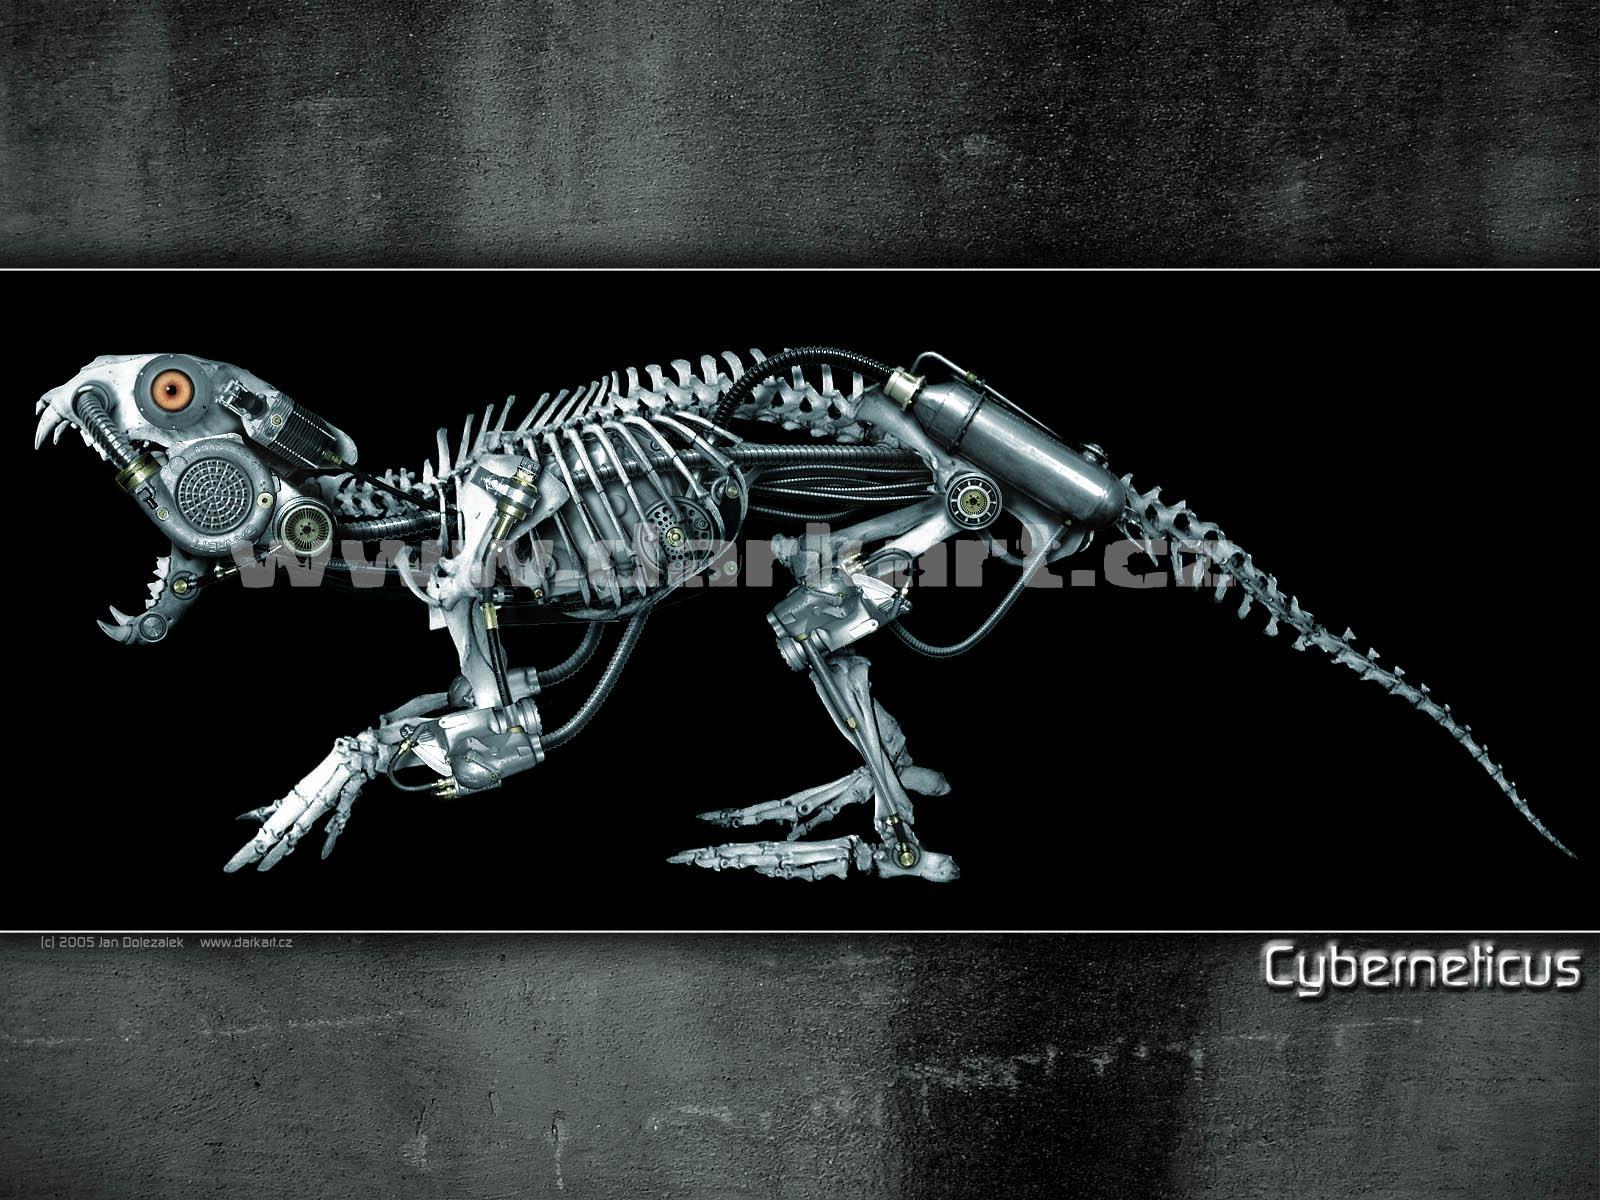 Cyberneticus by hunterkiller